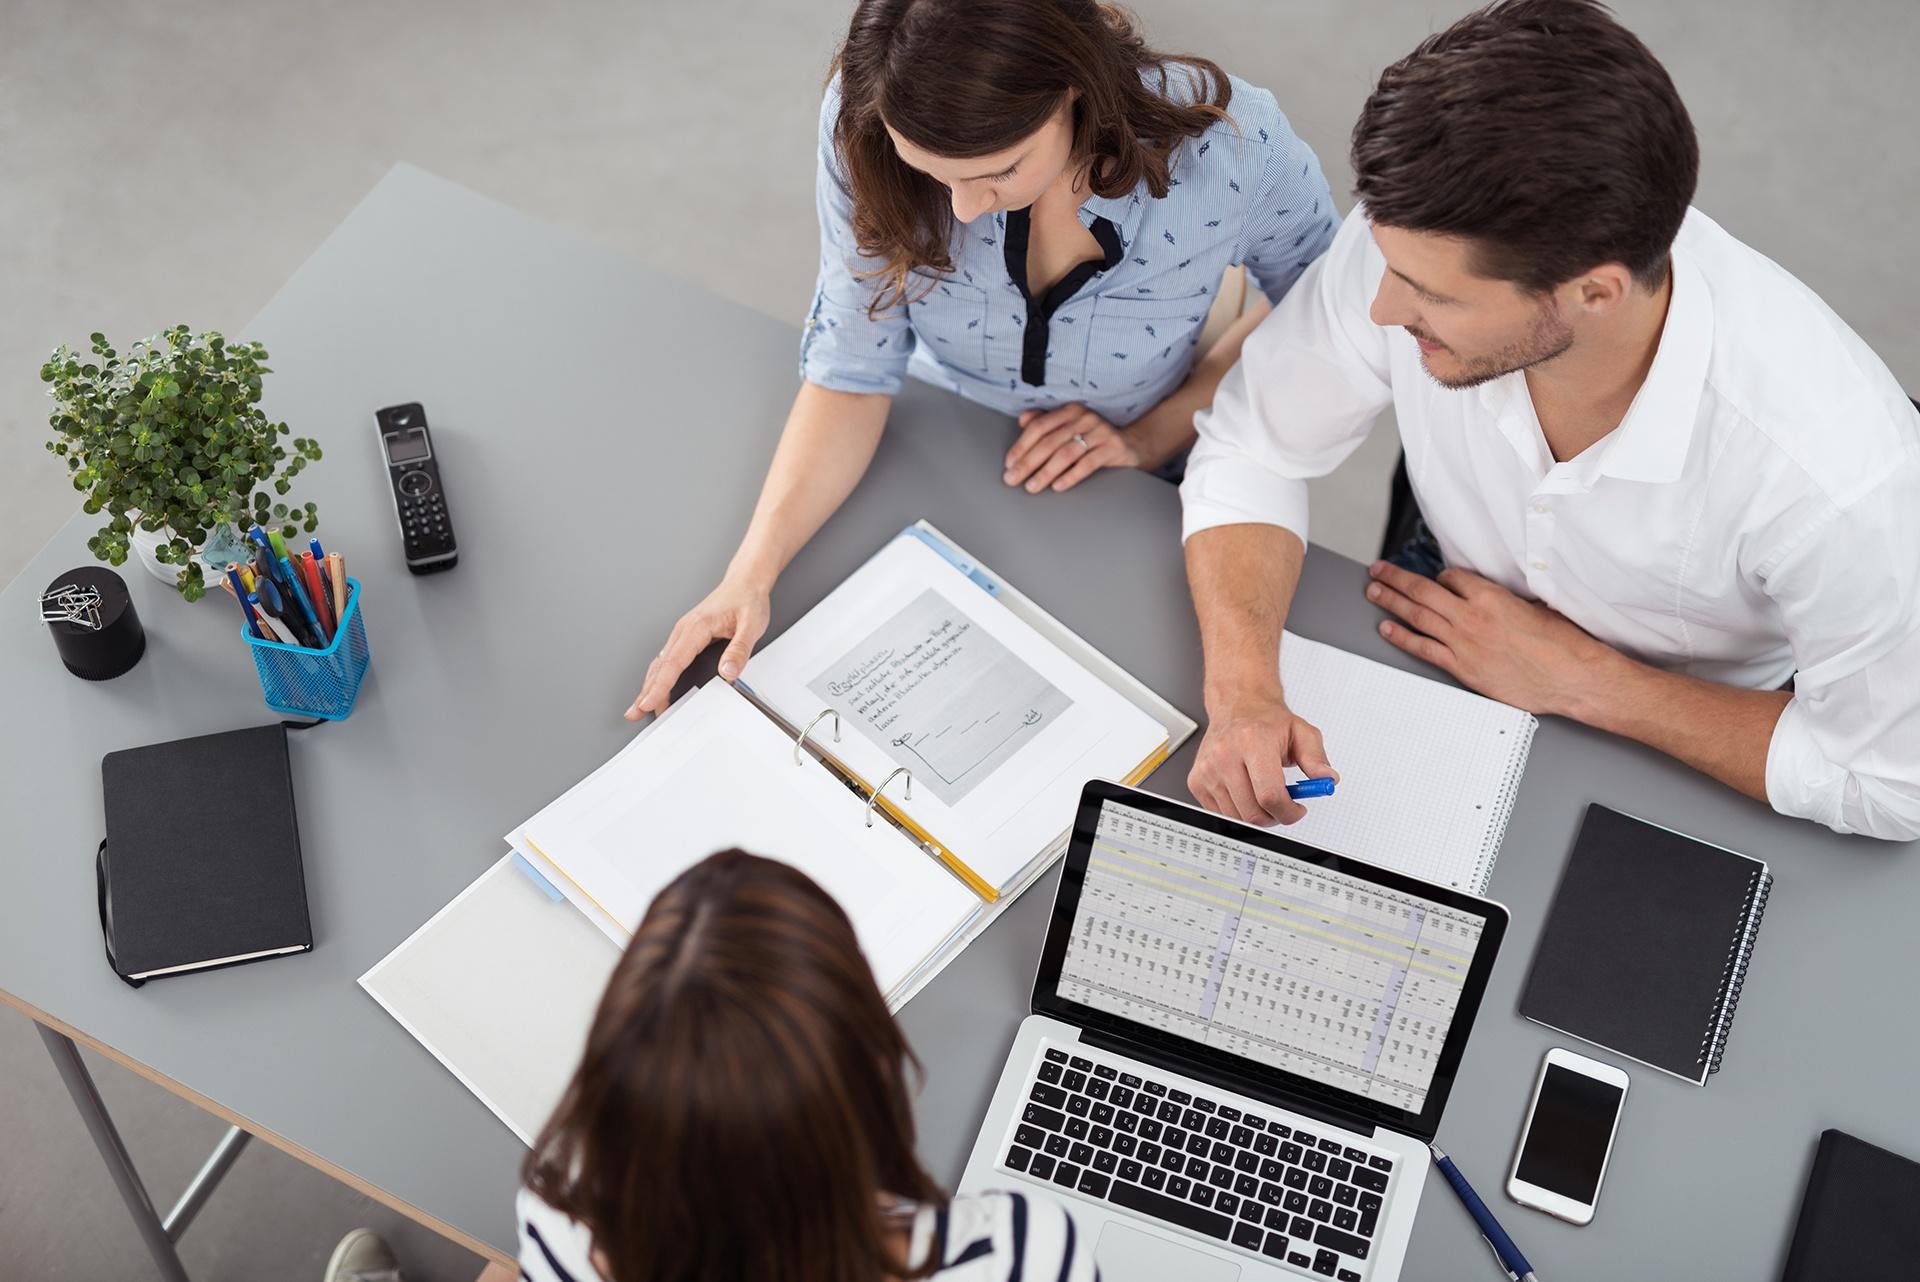 Freelance consultants работа в эксмо фриланс отзывы